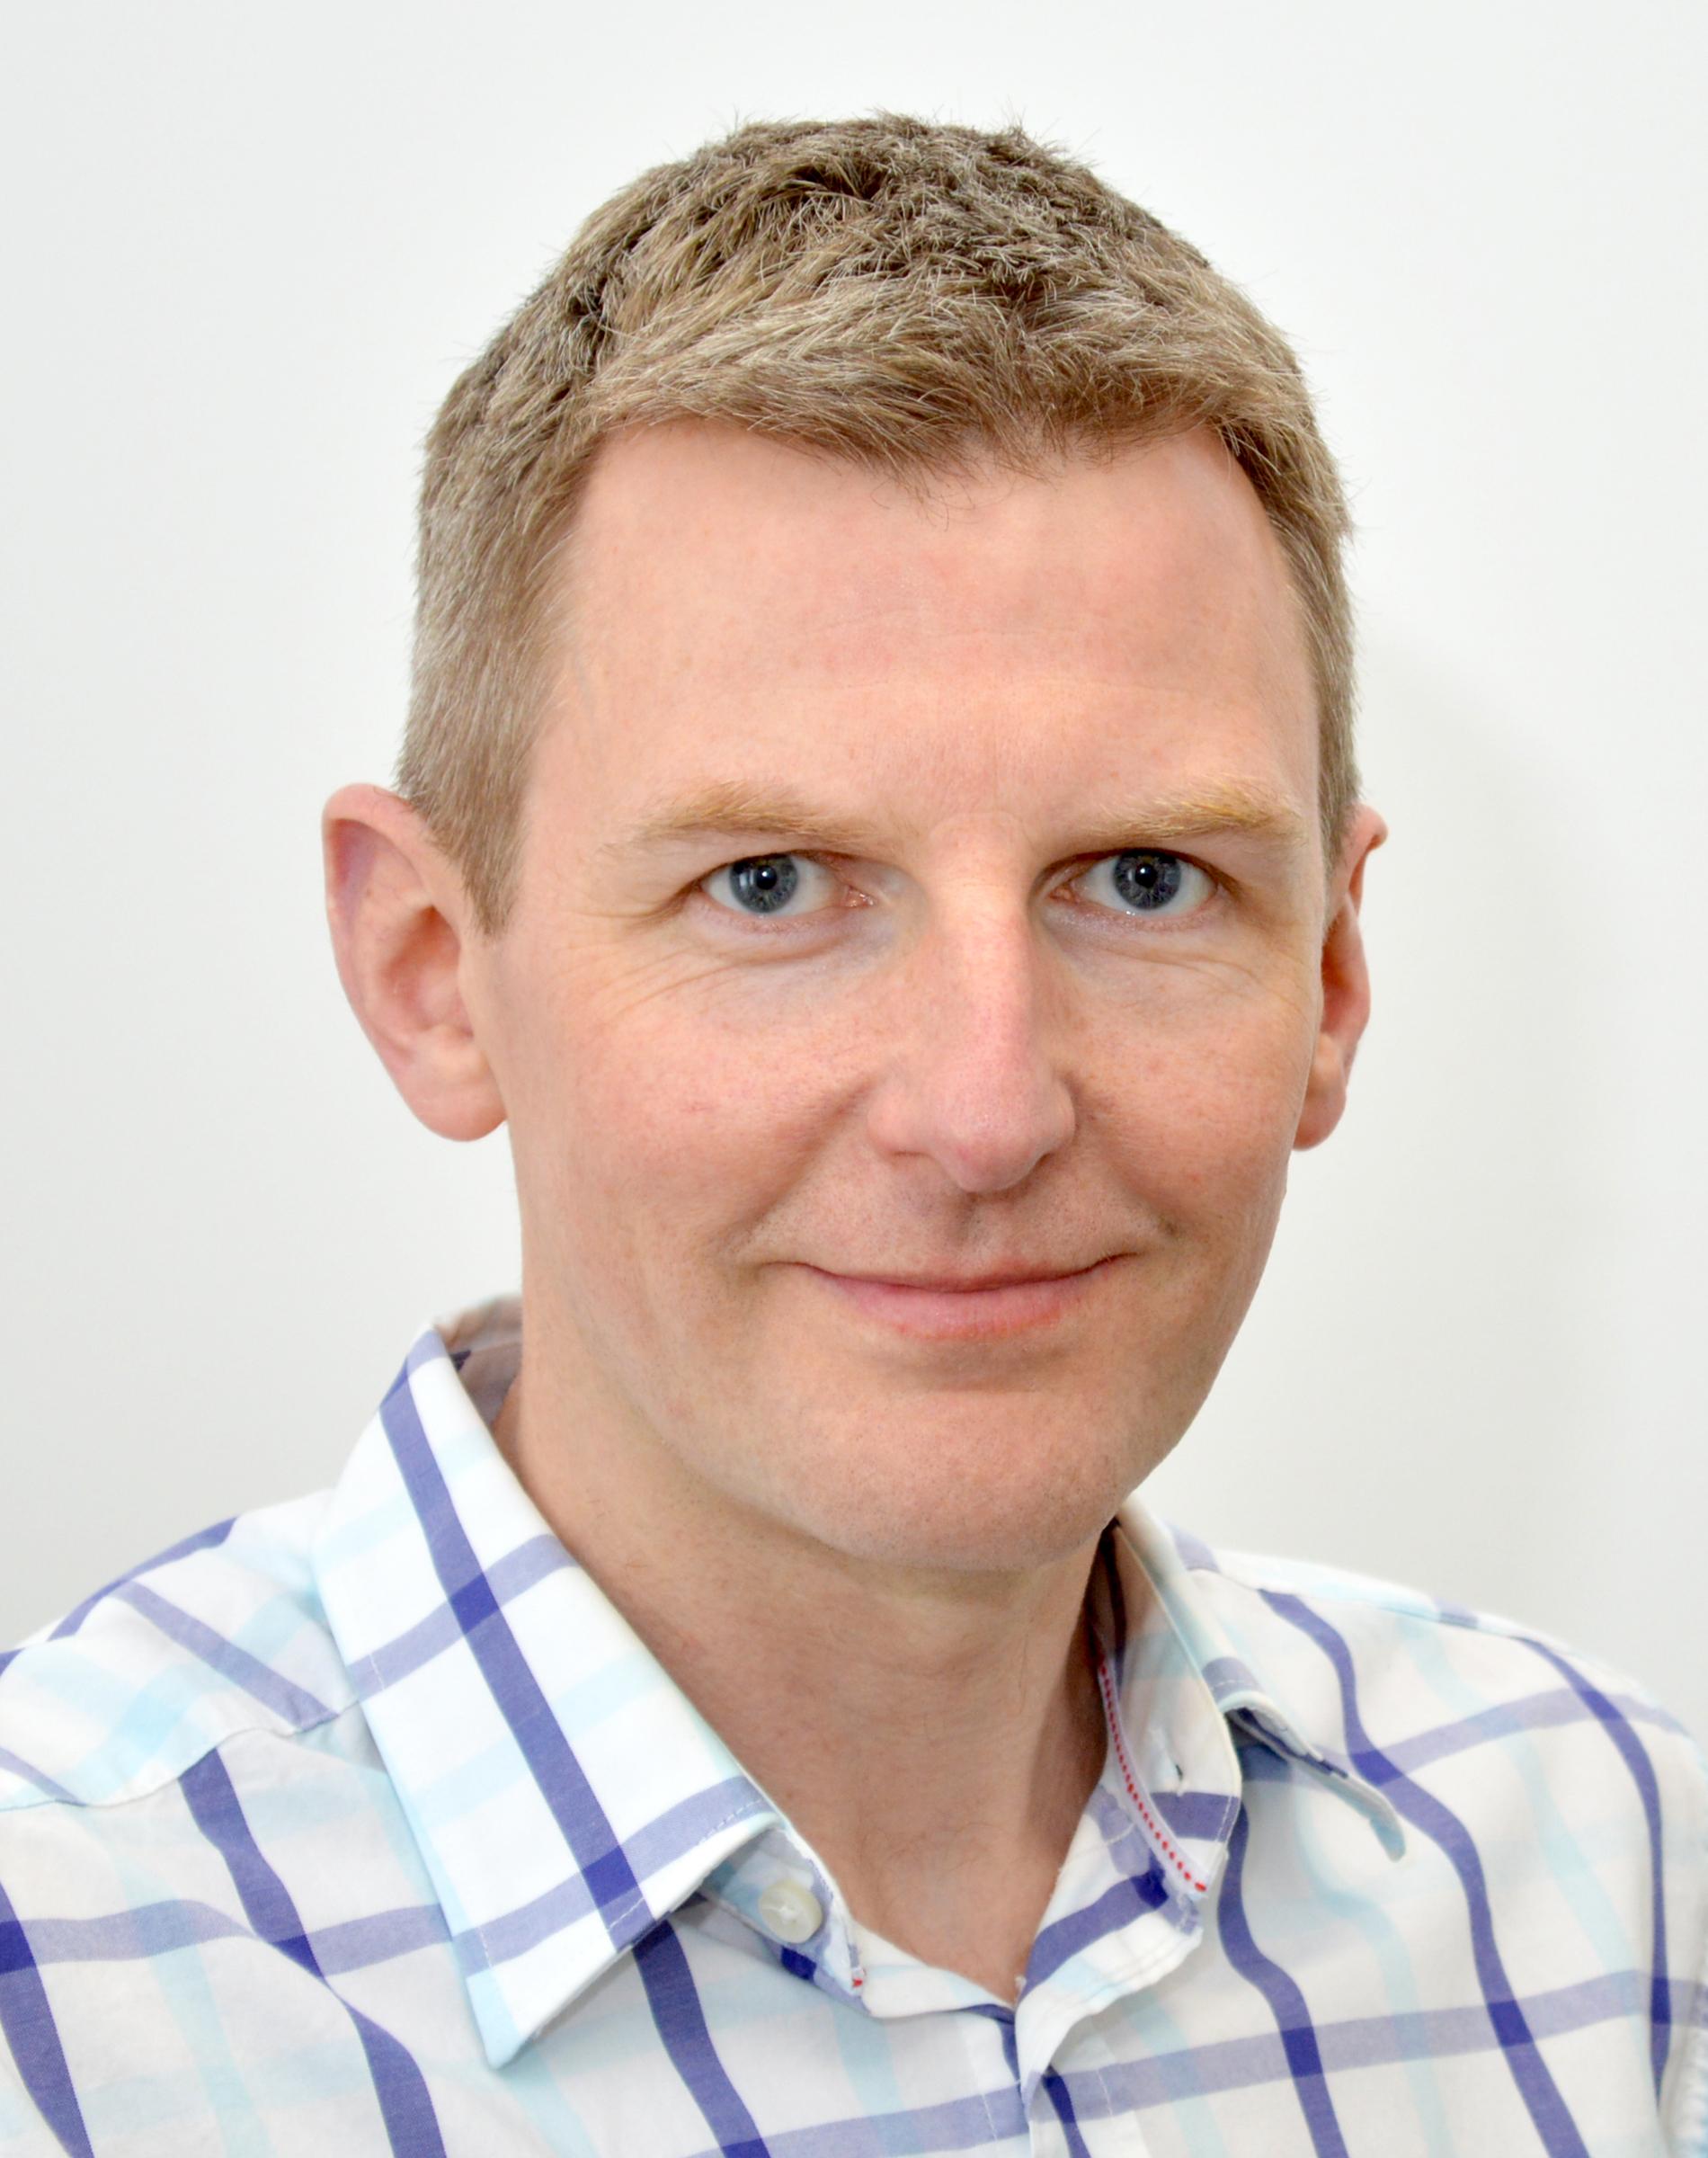 Alastair Edwards